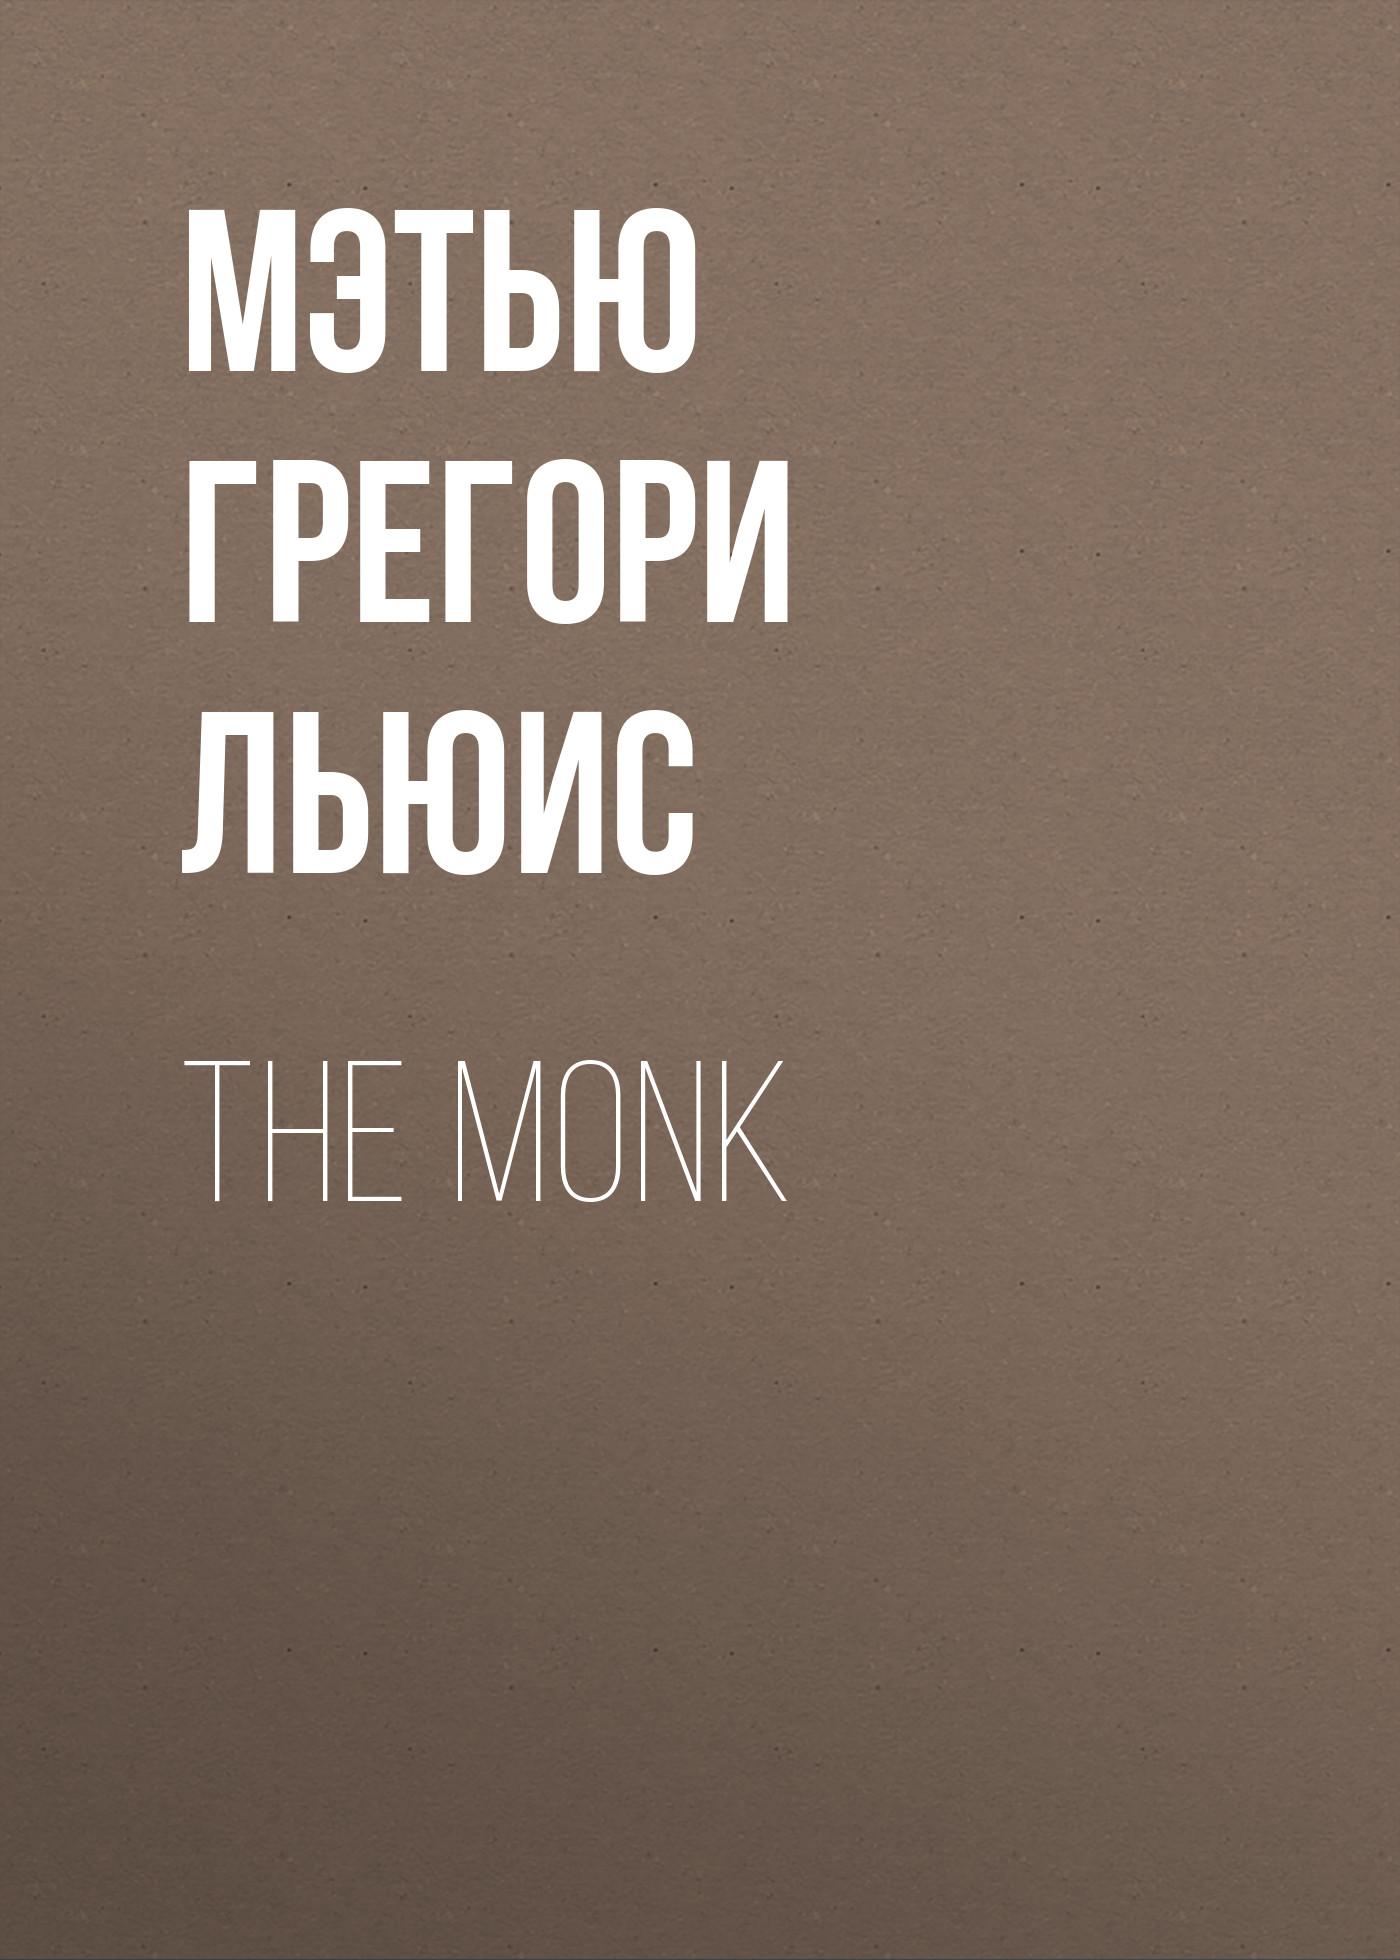 Мэтью Грегори Льюис The Monk the monk